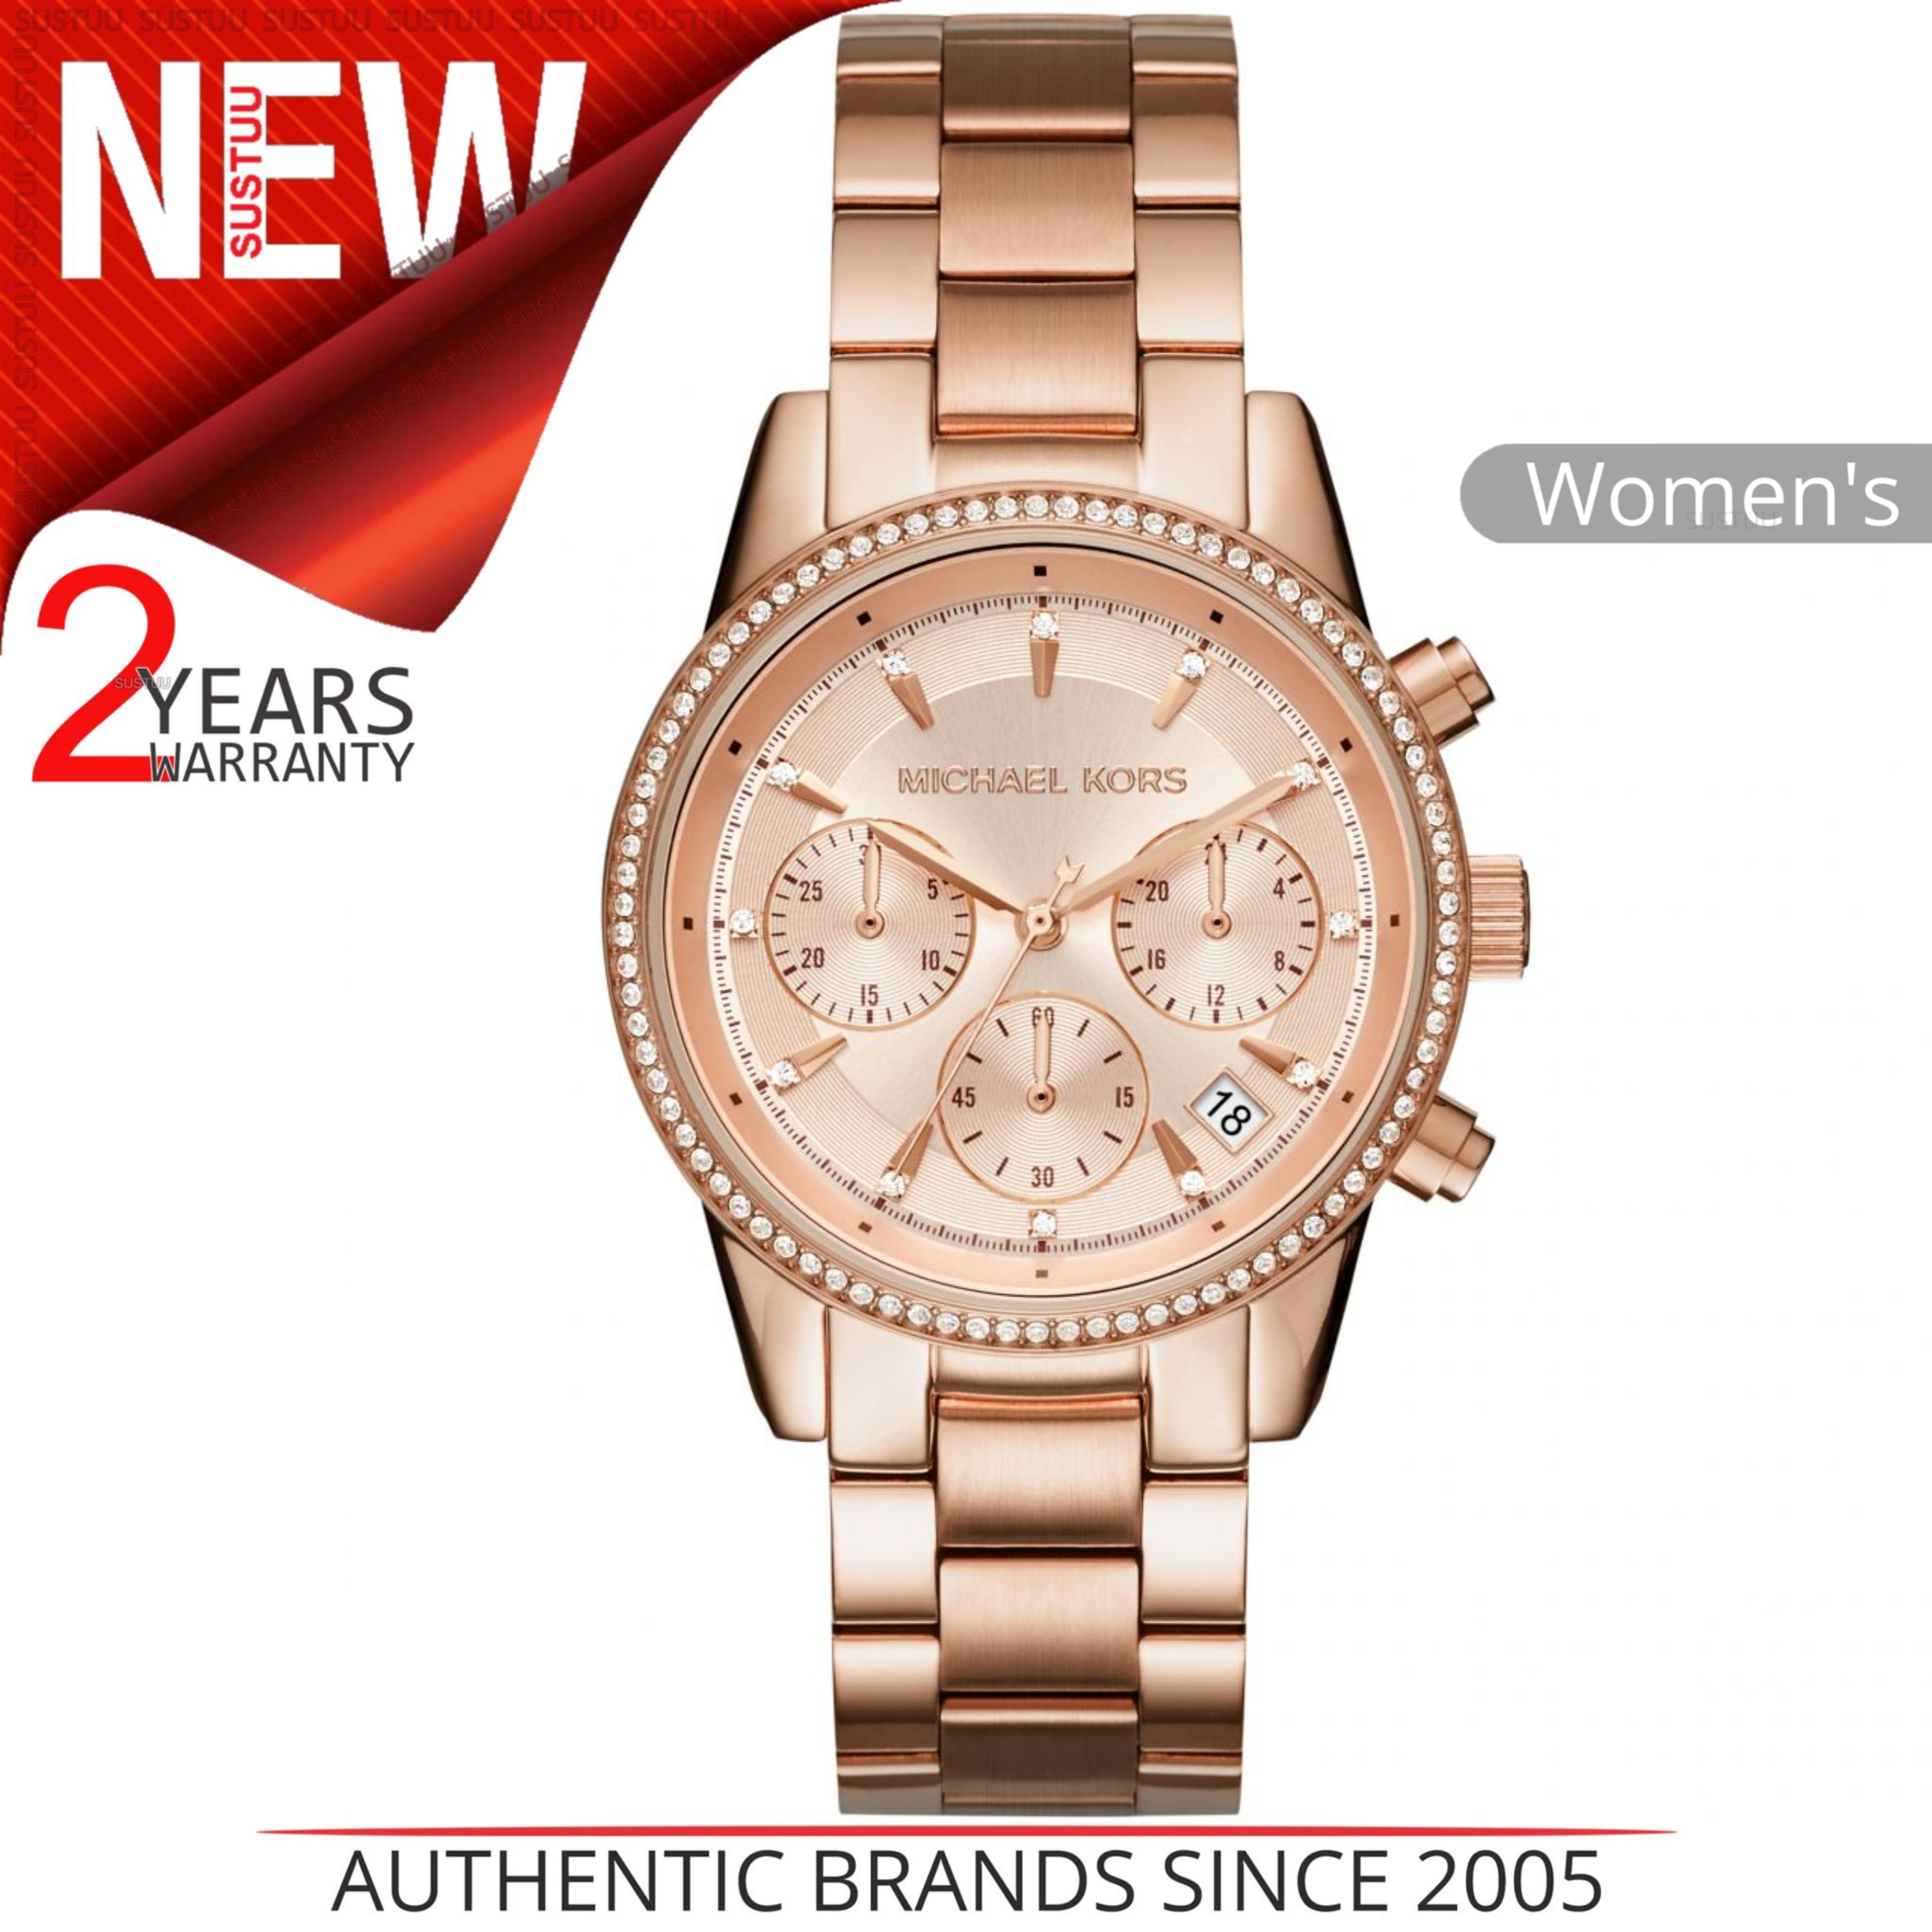 66a65309582 Details about Michael Kors Ritz Women Watch MK6357│Crystal Index Dial│Rose  Gold Bracelet Band